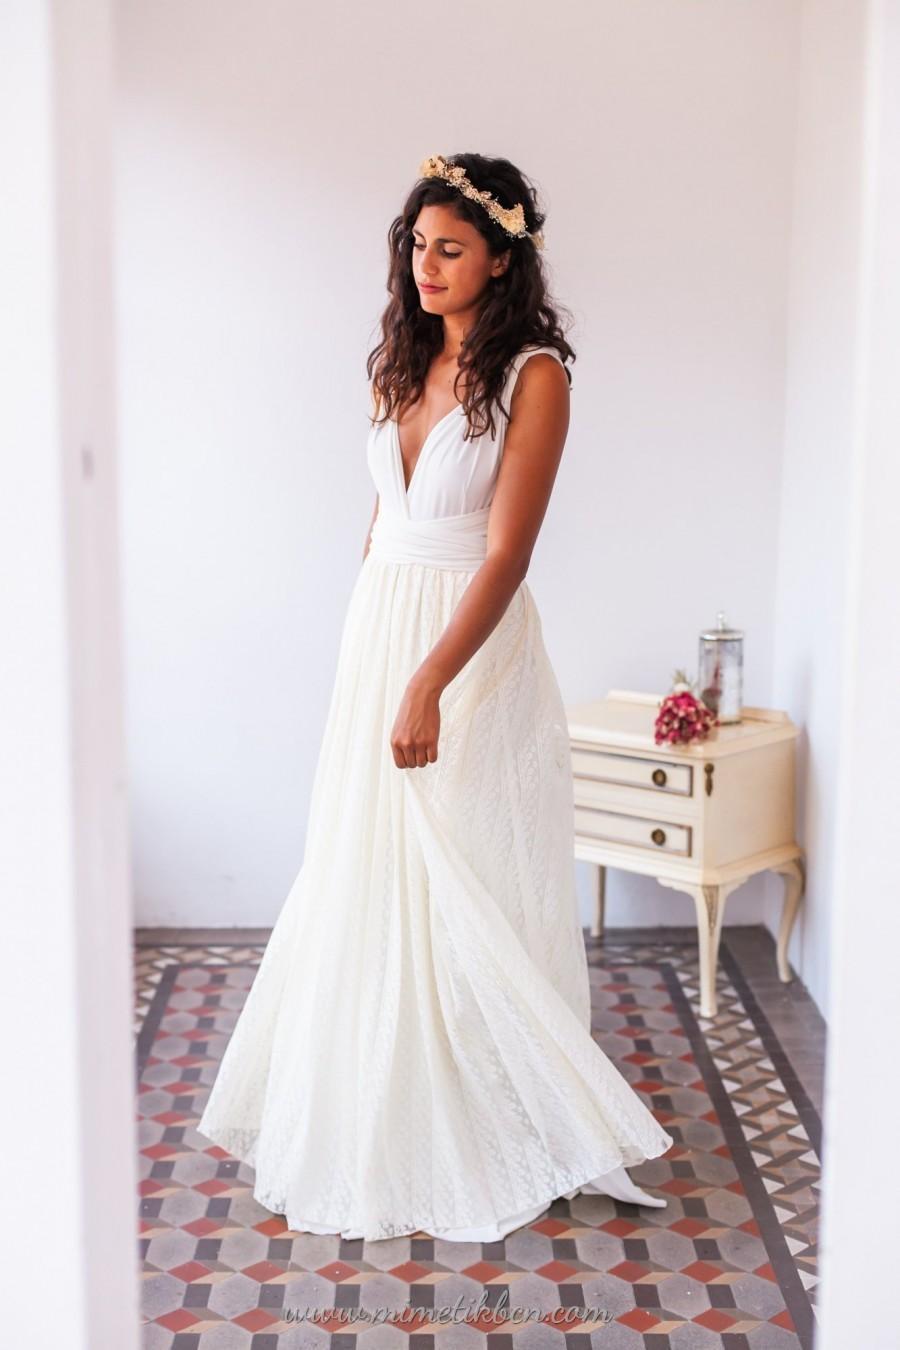 Lace Wedding Dress Romantic Wedding Dress Lace Bridal Gown